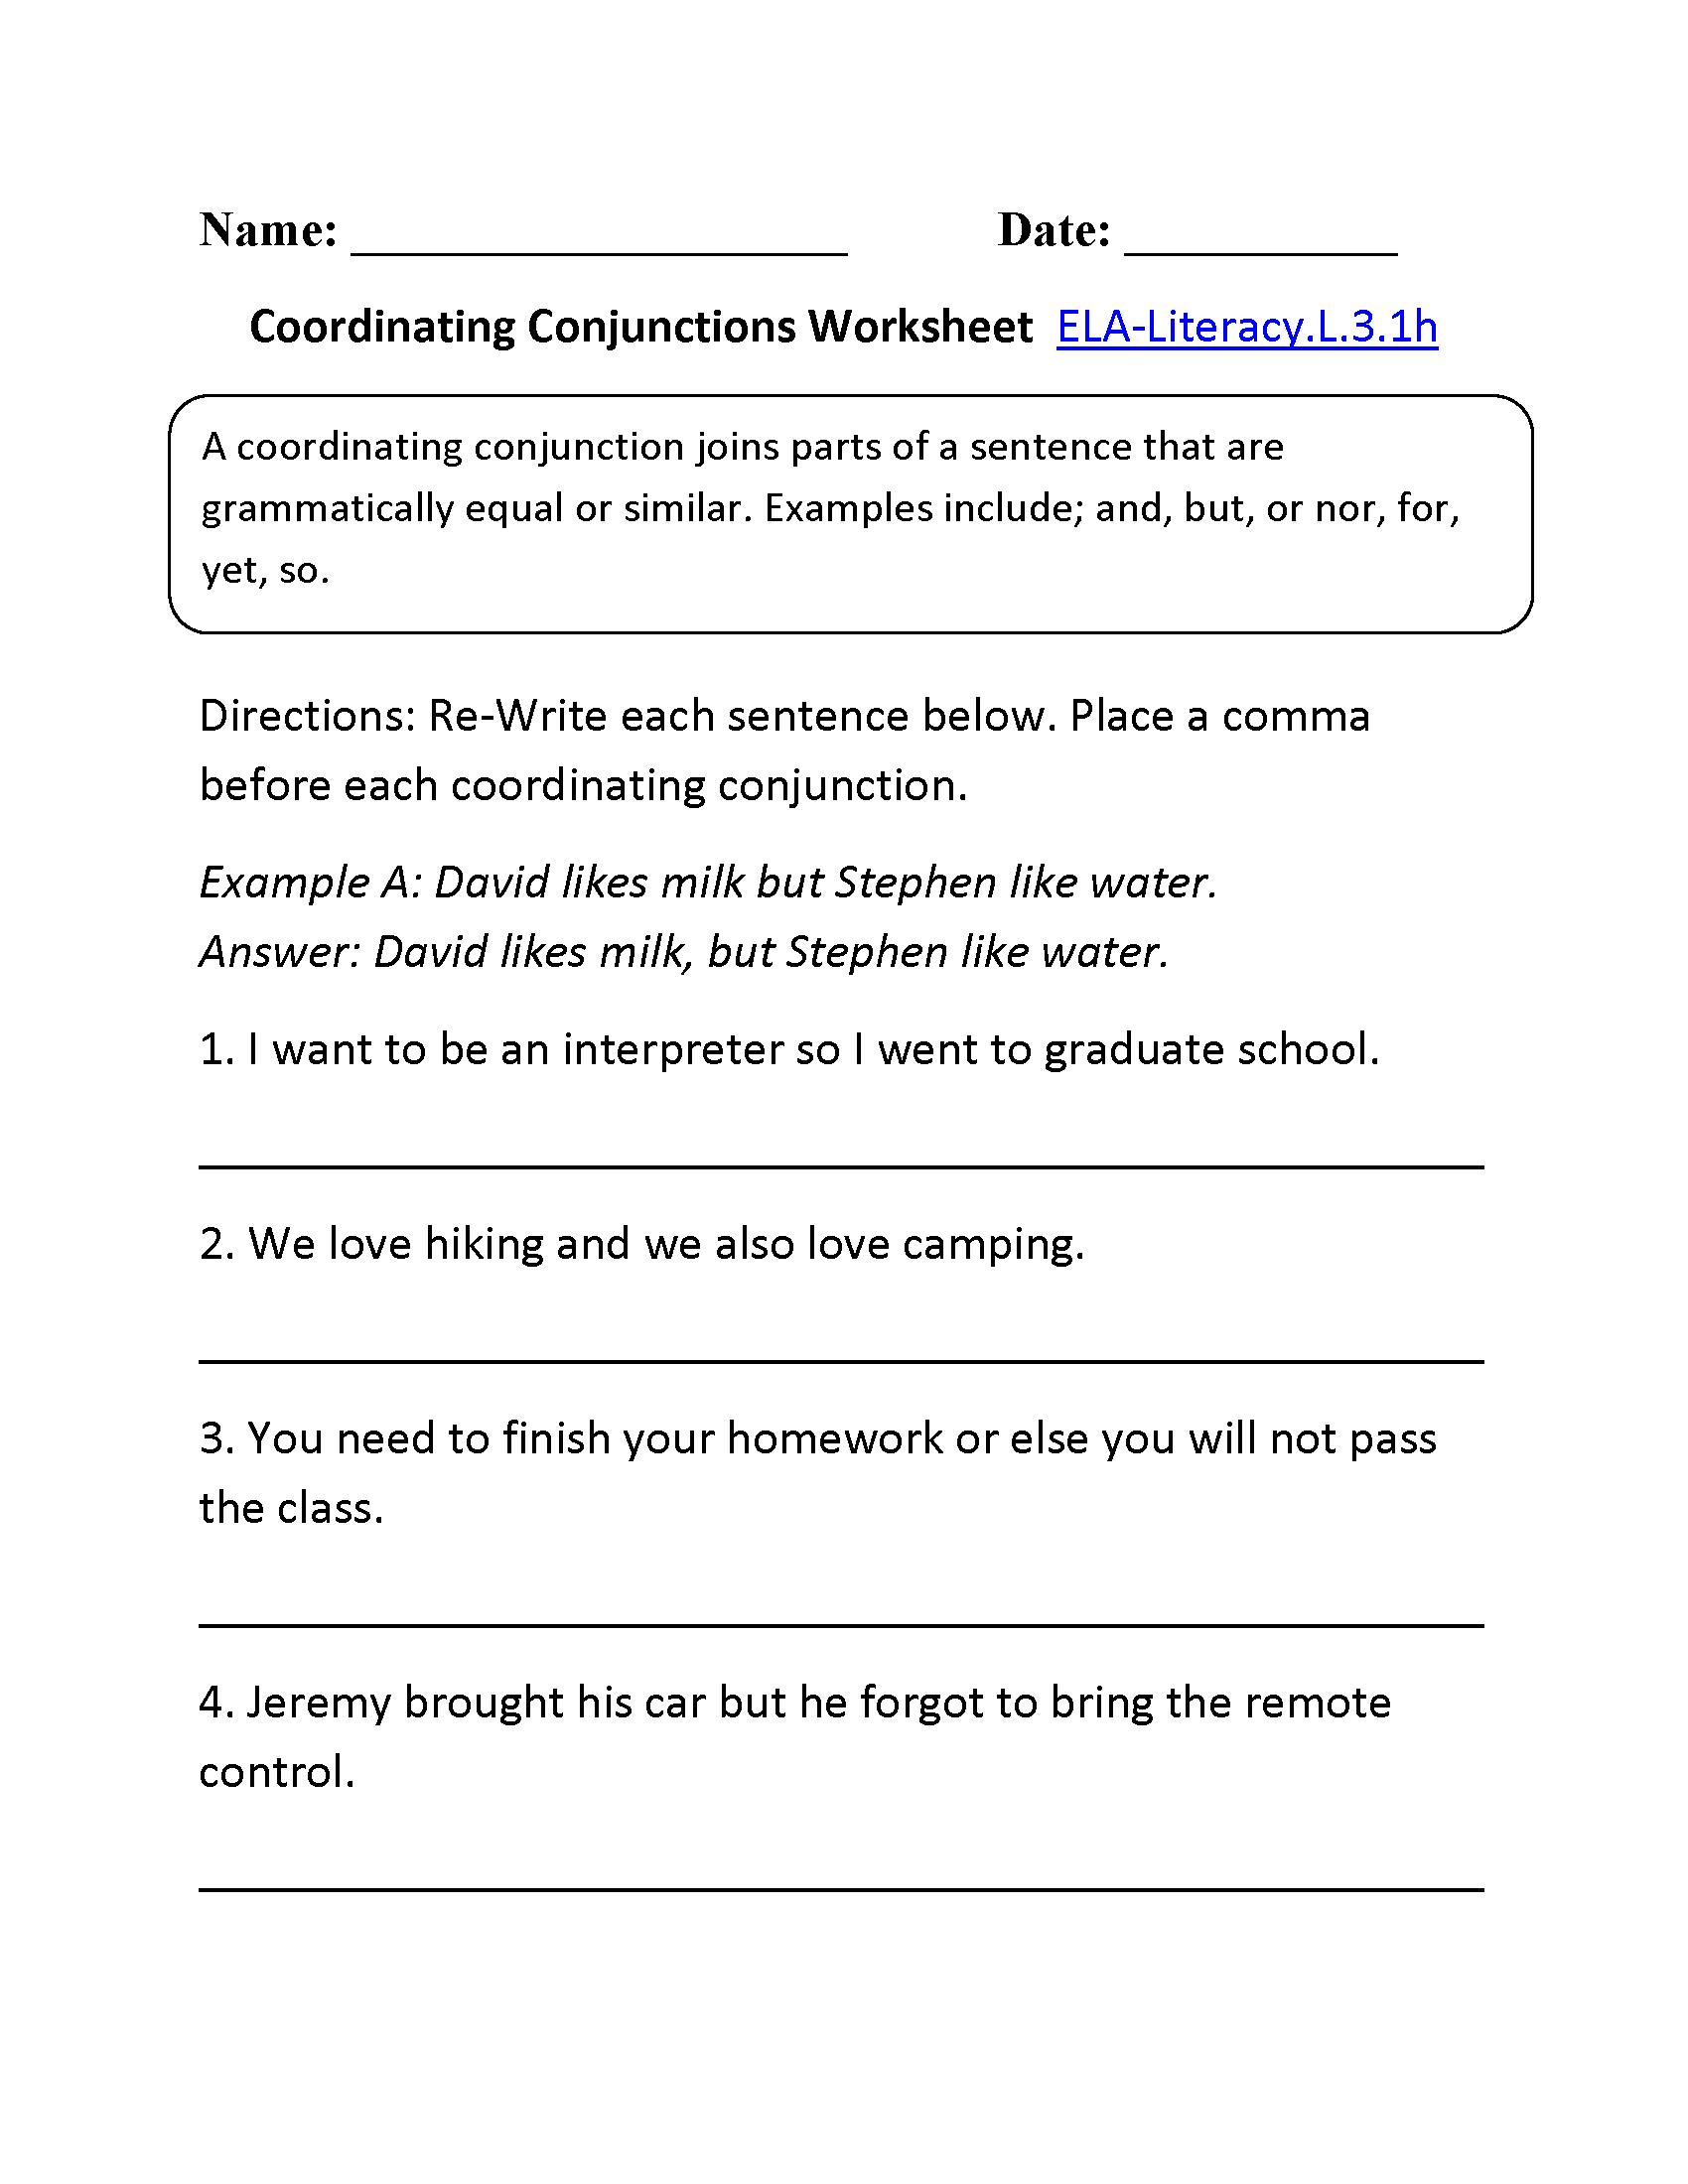 Coordinating Conjunctions Worksheet 1 L 3 1